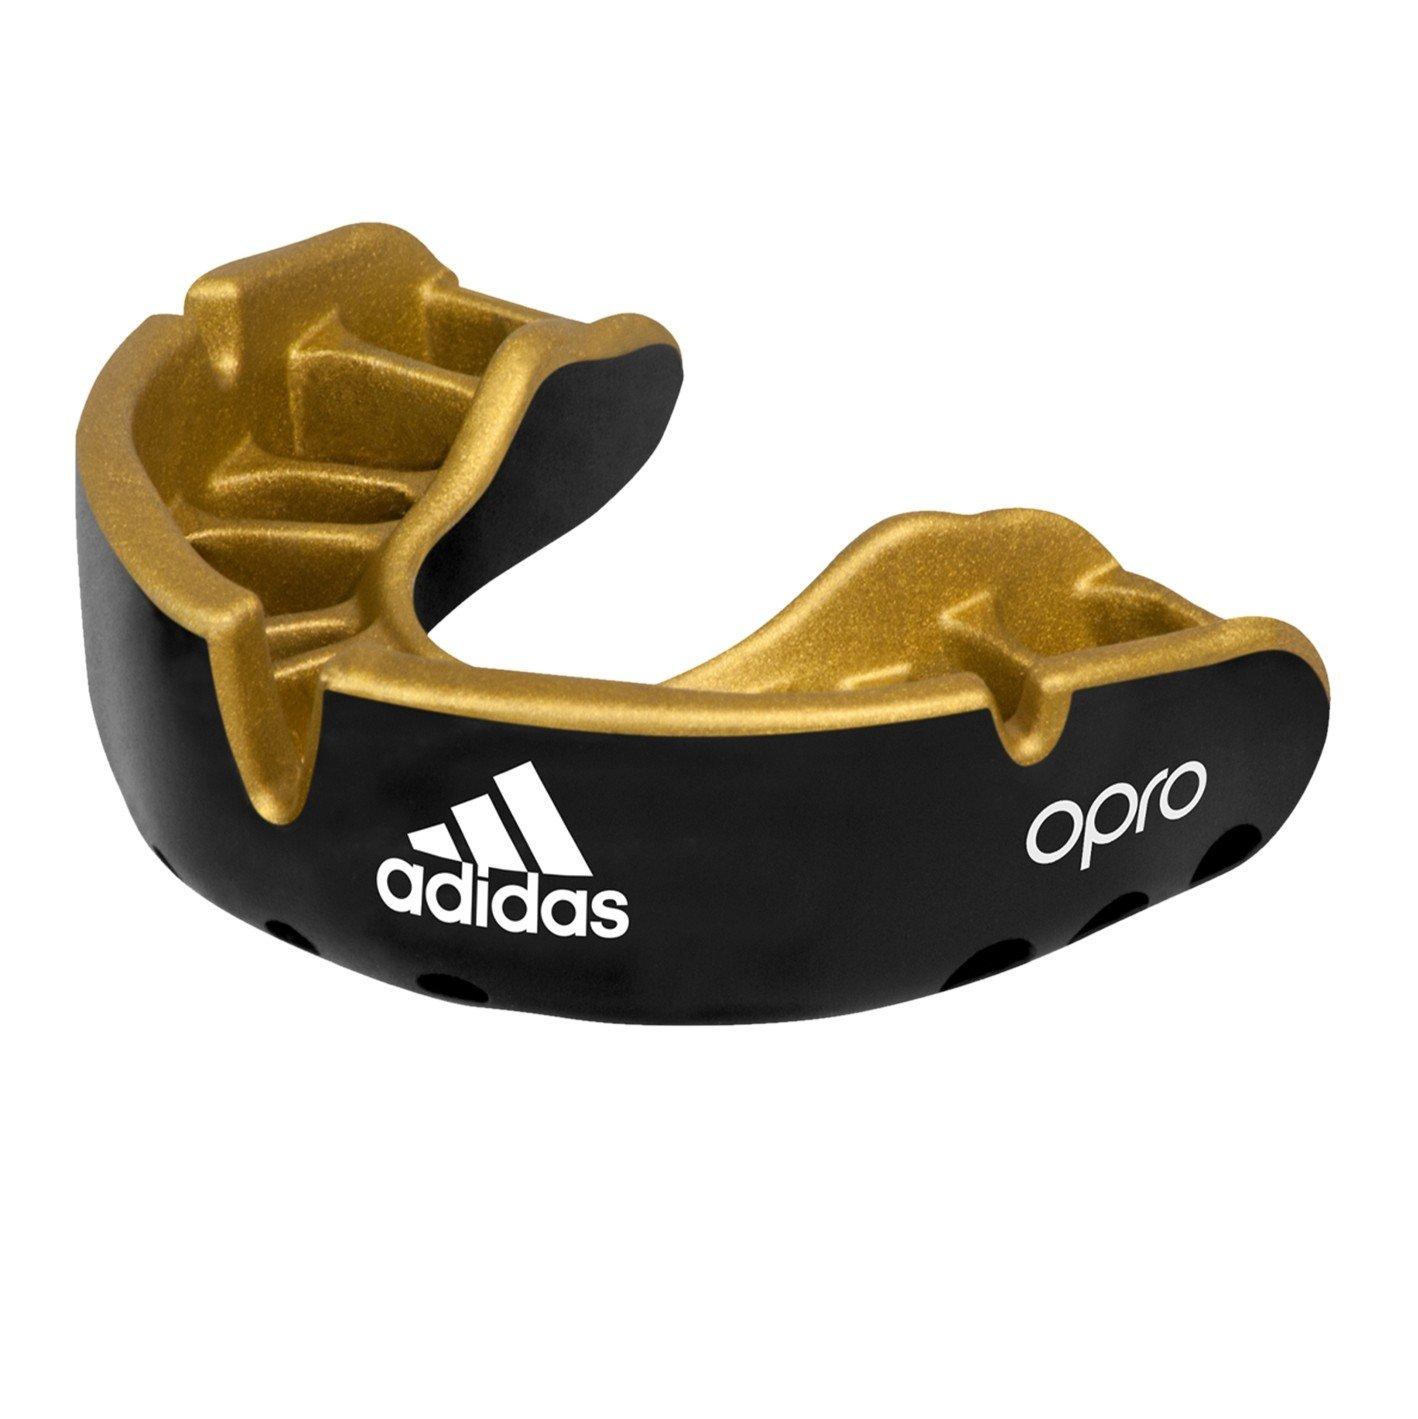 Opro Adidas Mouthguard Gold Senior - Black